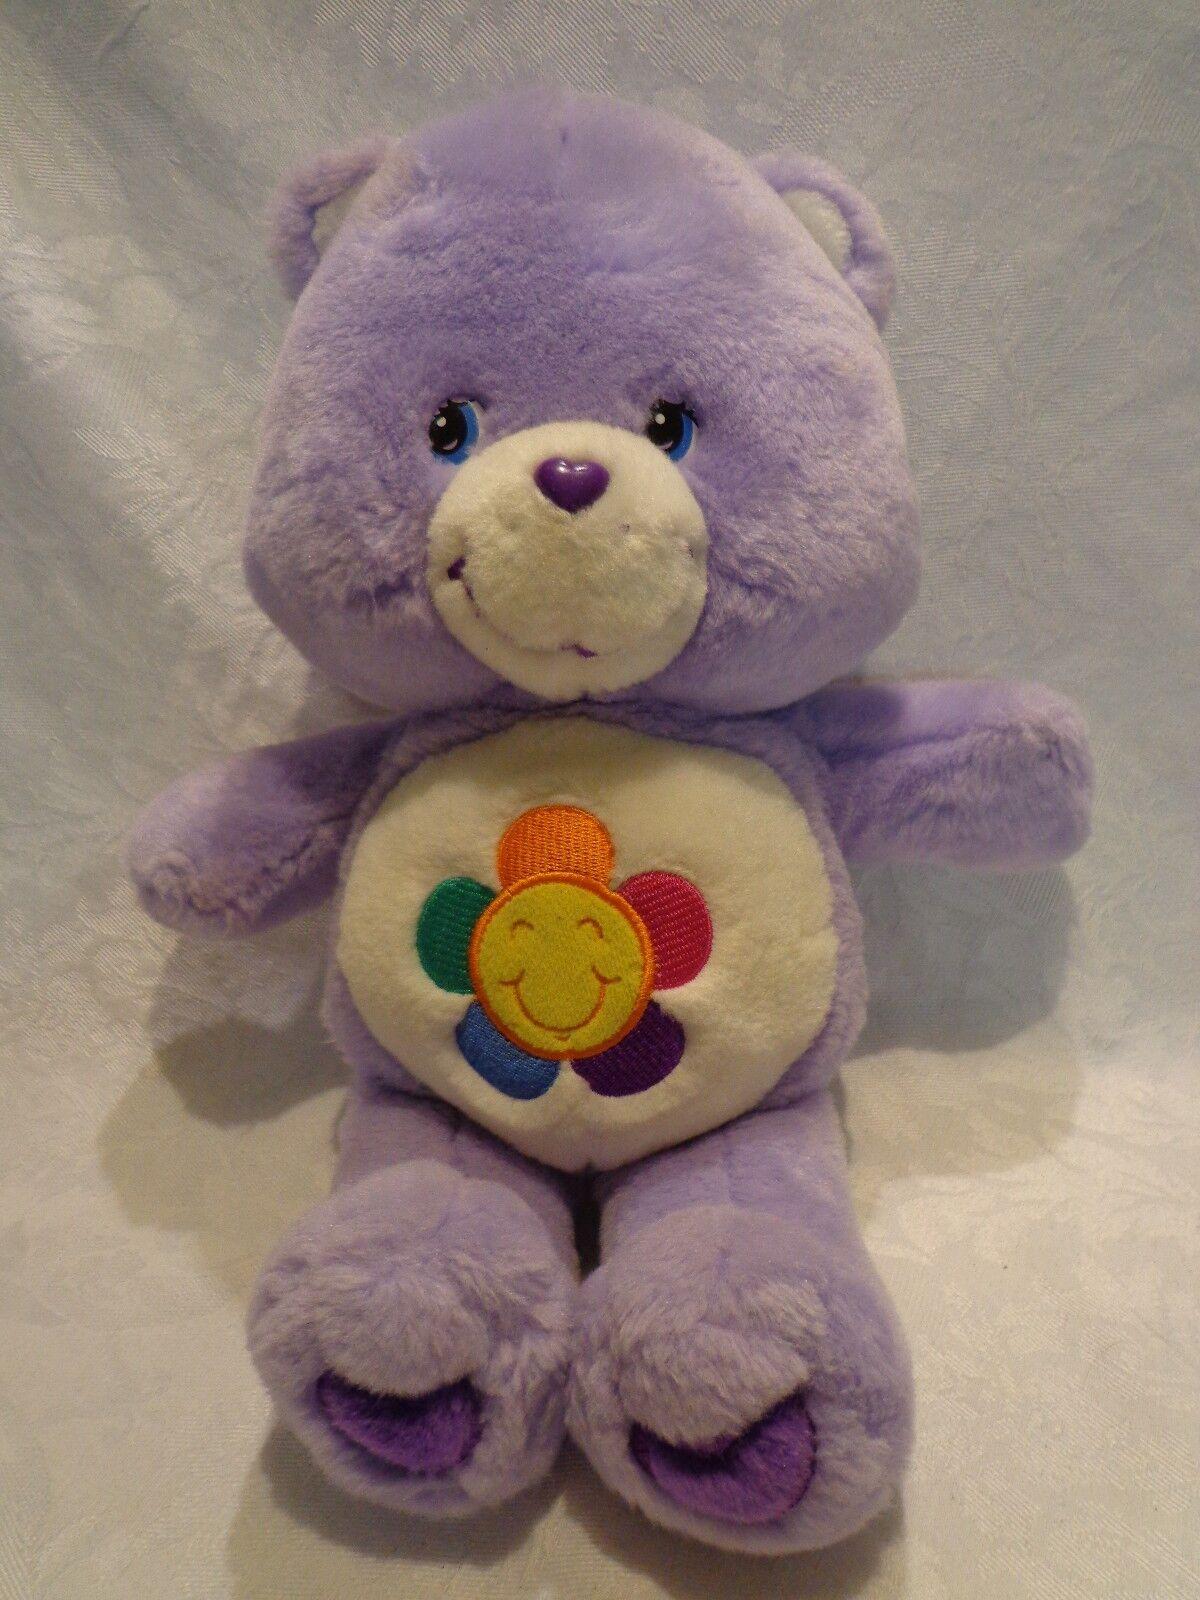 2003 Play Along Care Bear Harmony Talking 14  Plush Soft Toy Stuffed Animal